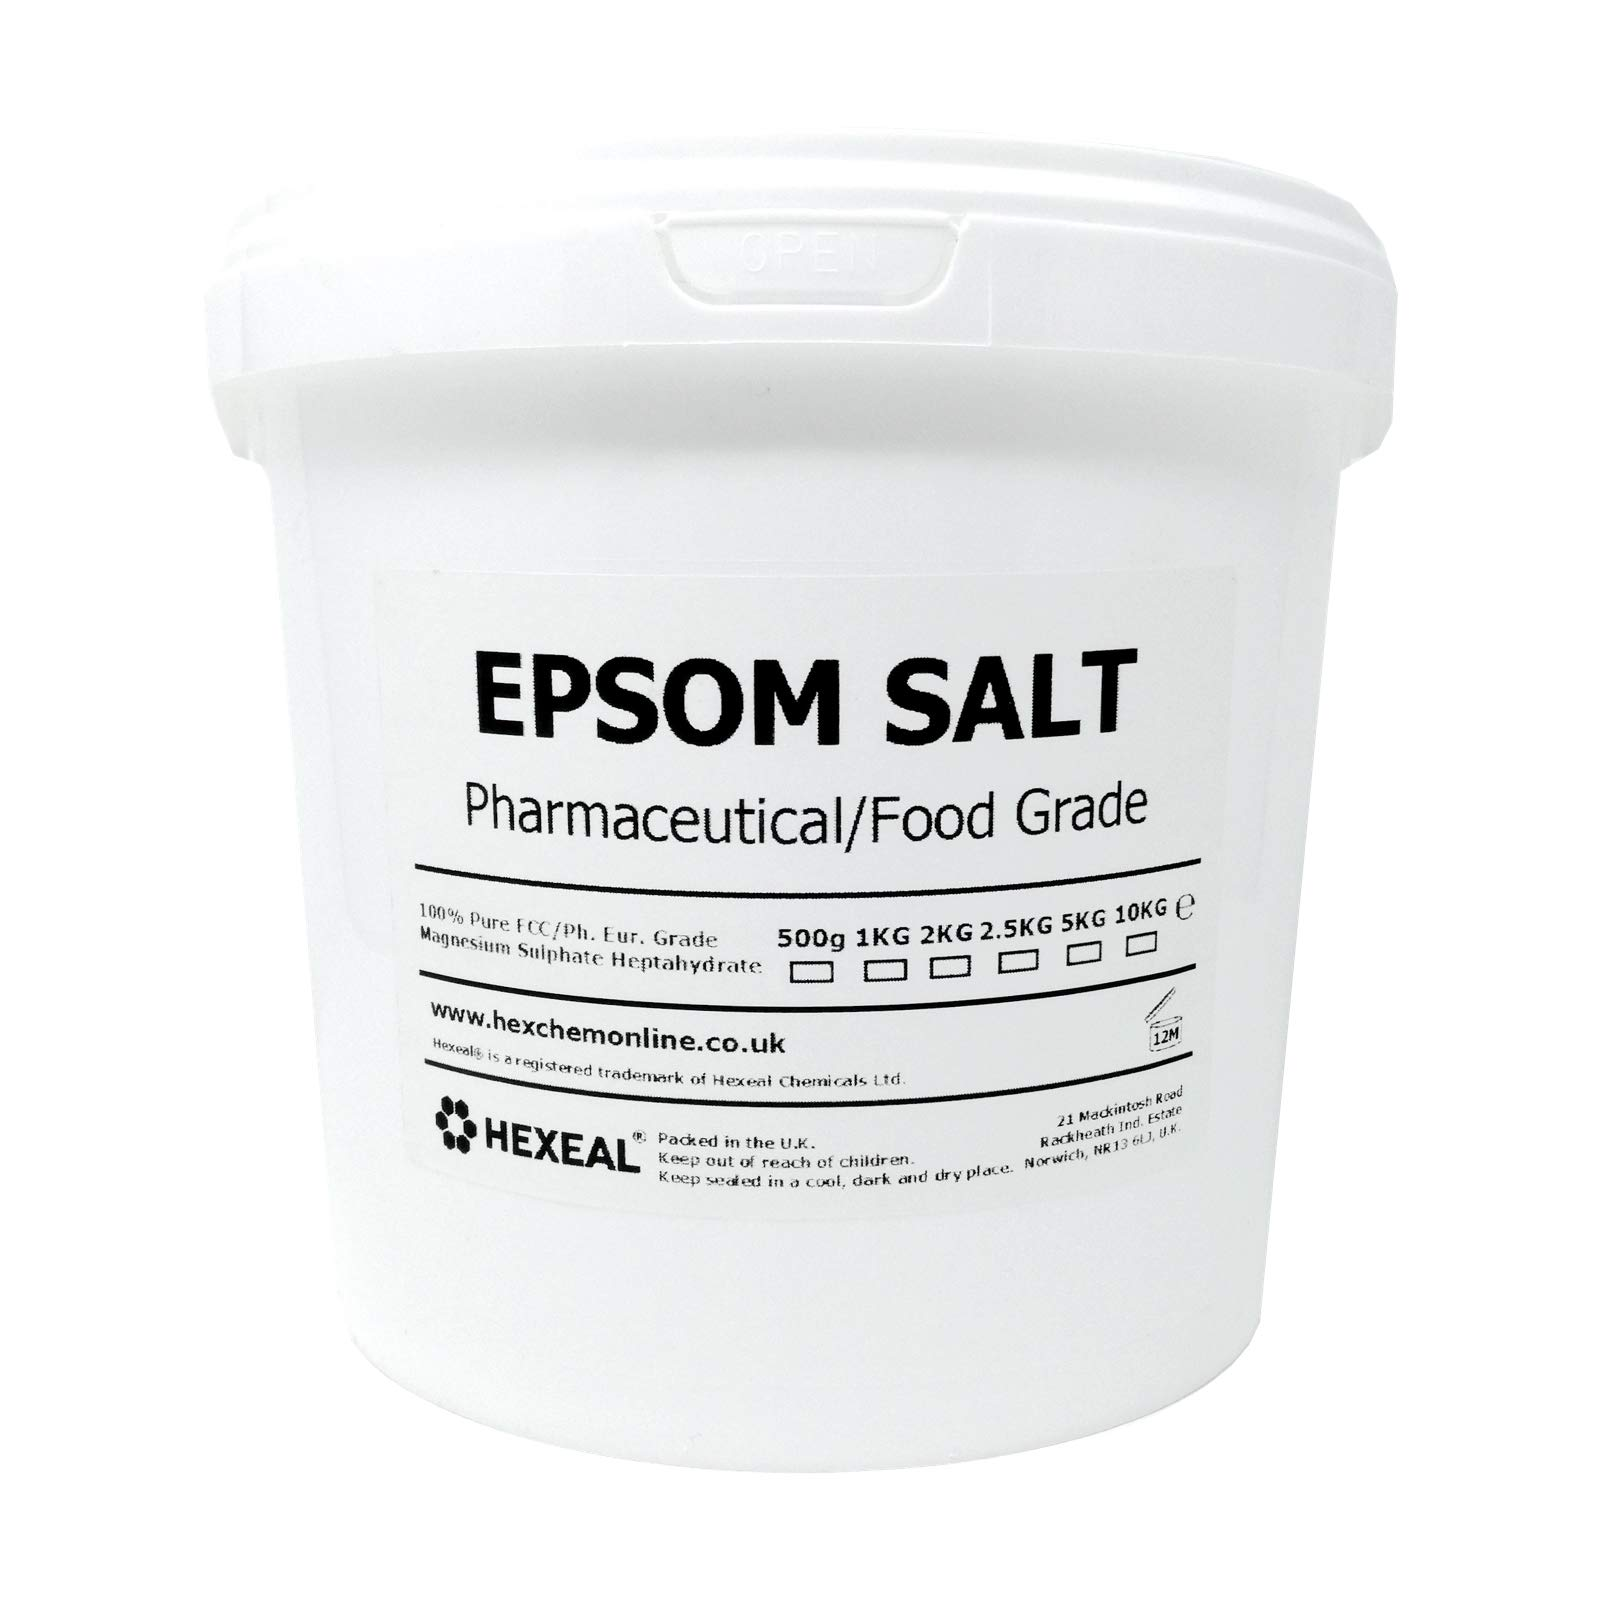 Hexeal EPSOM SALT | 5KG BUCKET | 100% Pharmaceutical | FCC Food Grade | Magnesium Sulphate